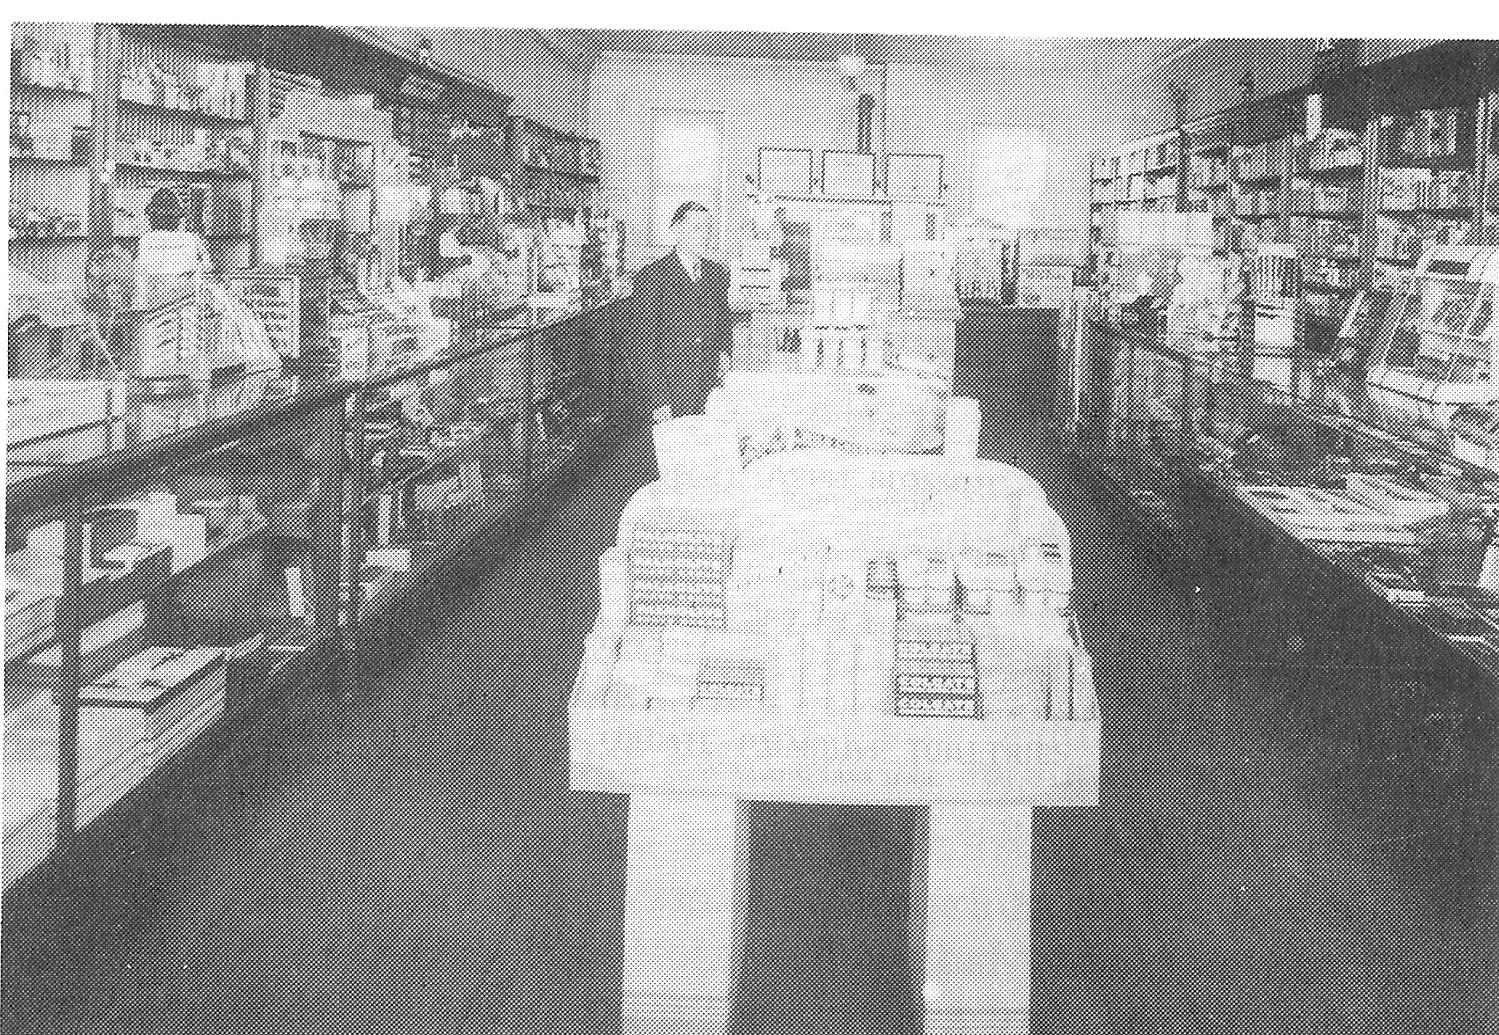 Hanson Drug Store